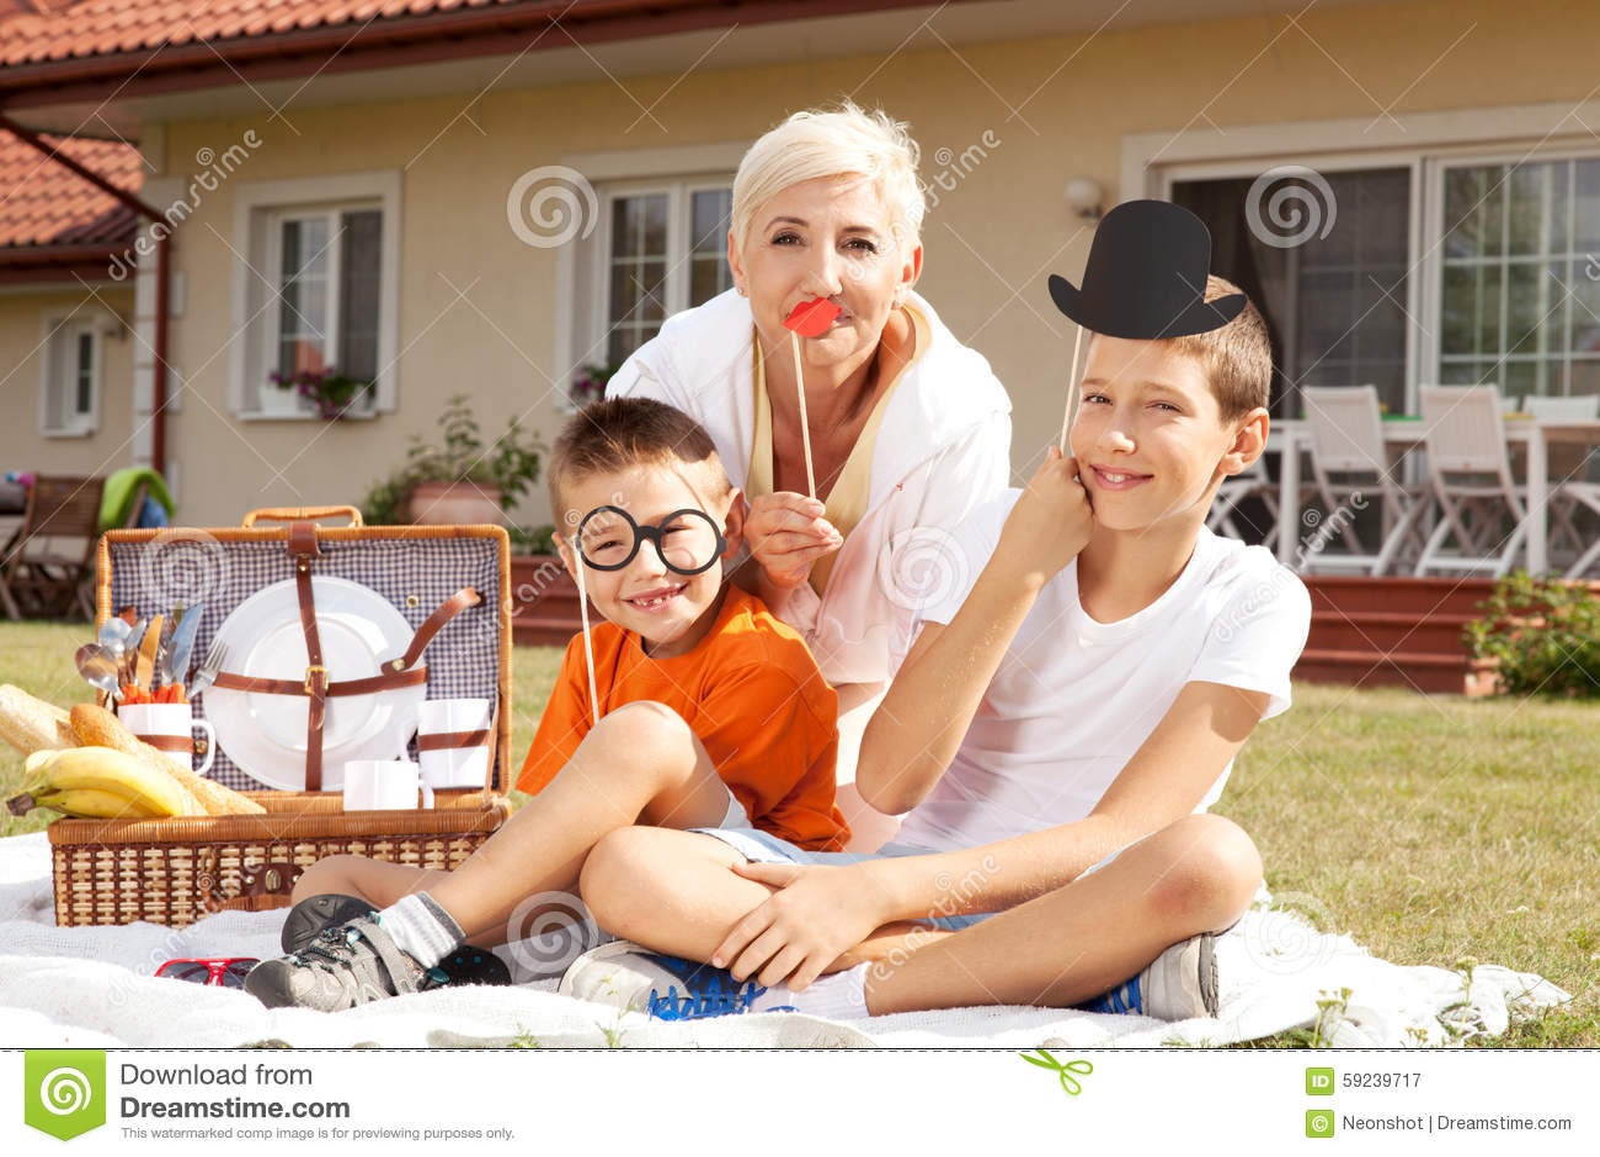 Download Fiesta De Cumpleaños De La Familia Imagen de archivo - Imagen de afuera, childcare: 59239717